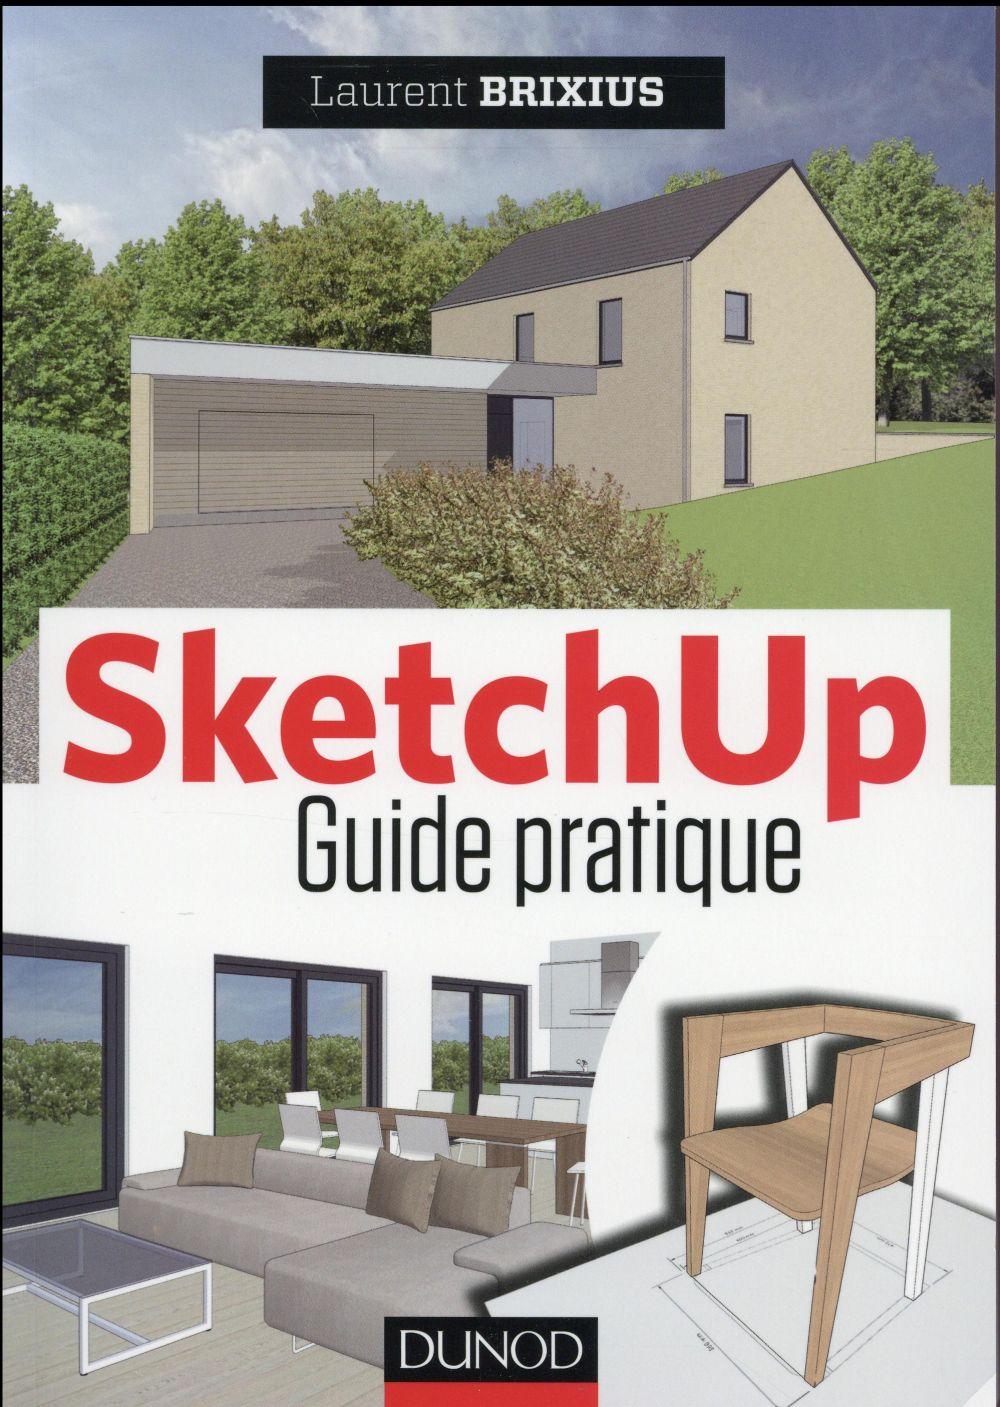 Brixius Laurent - SKETCHUP - GUIDE PRATIQUE